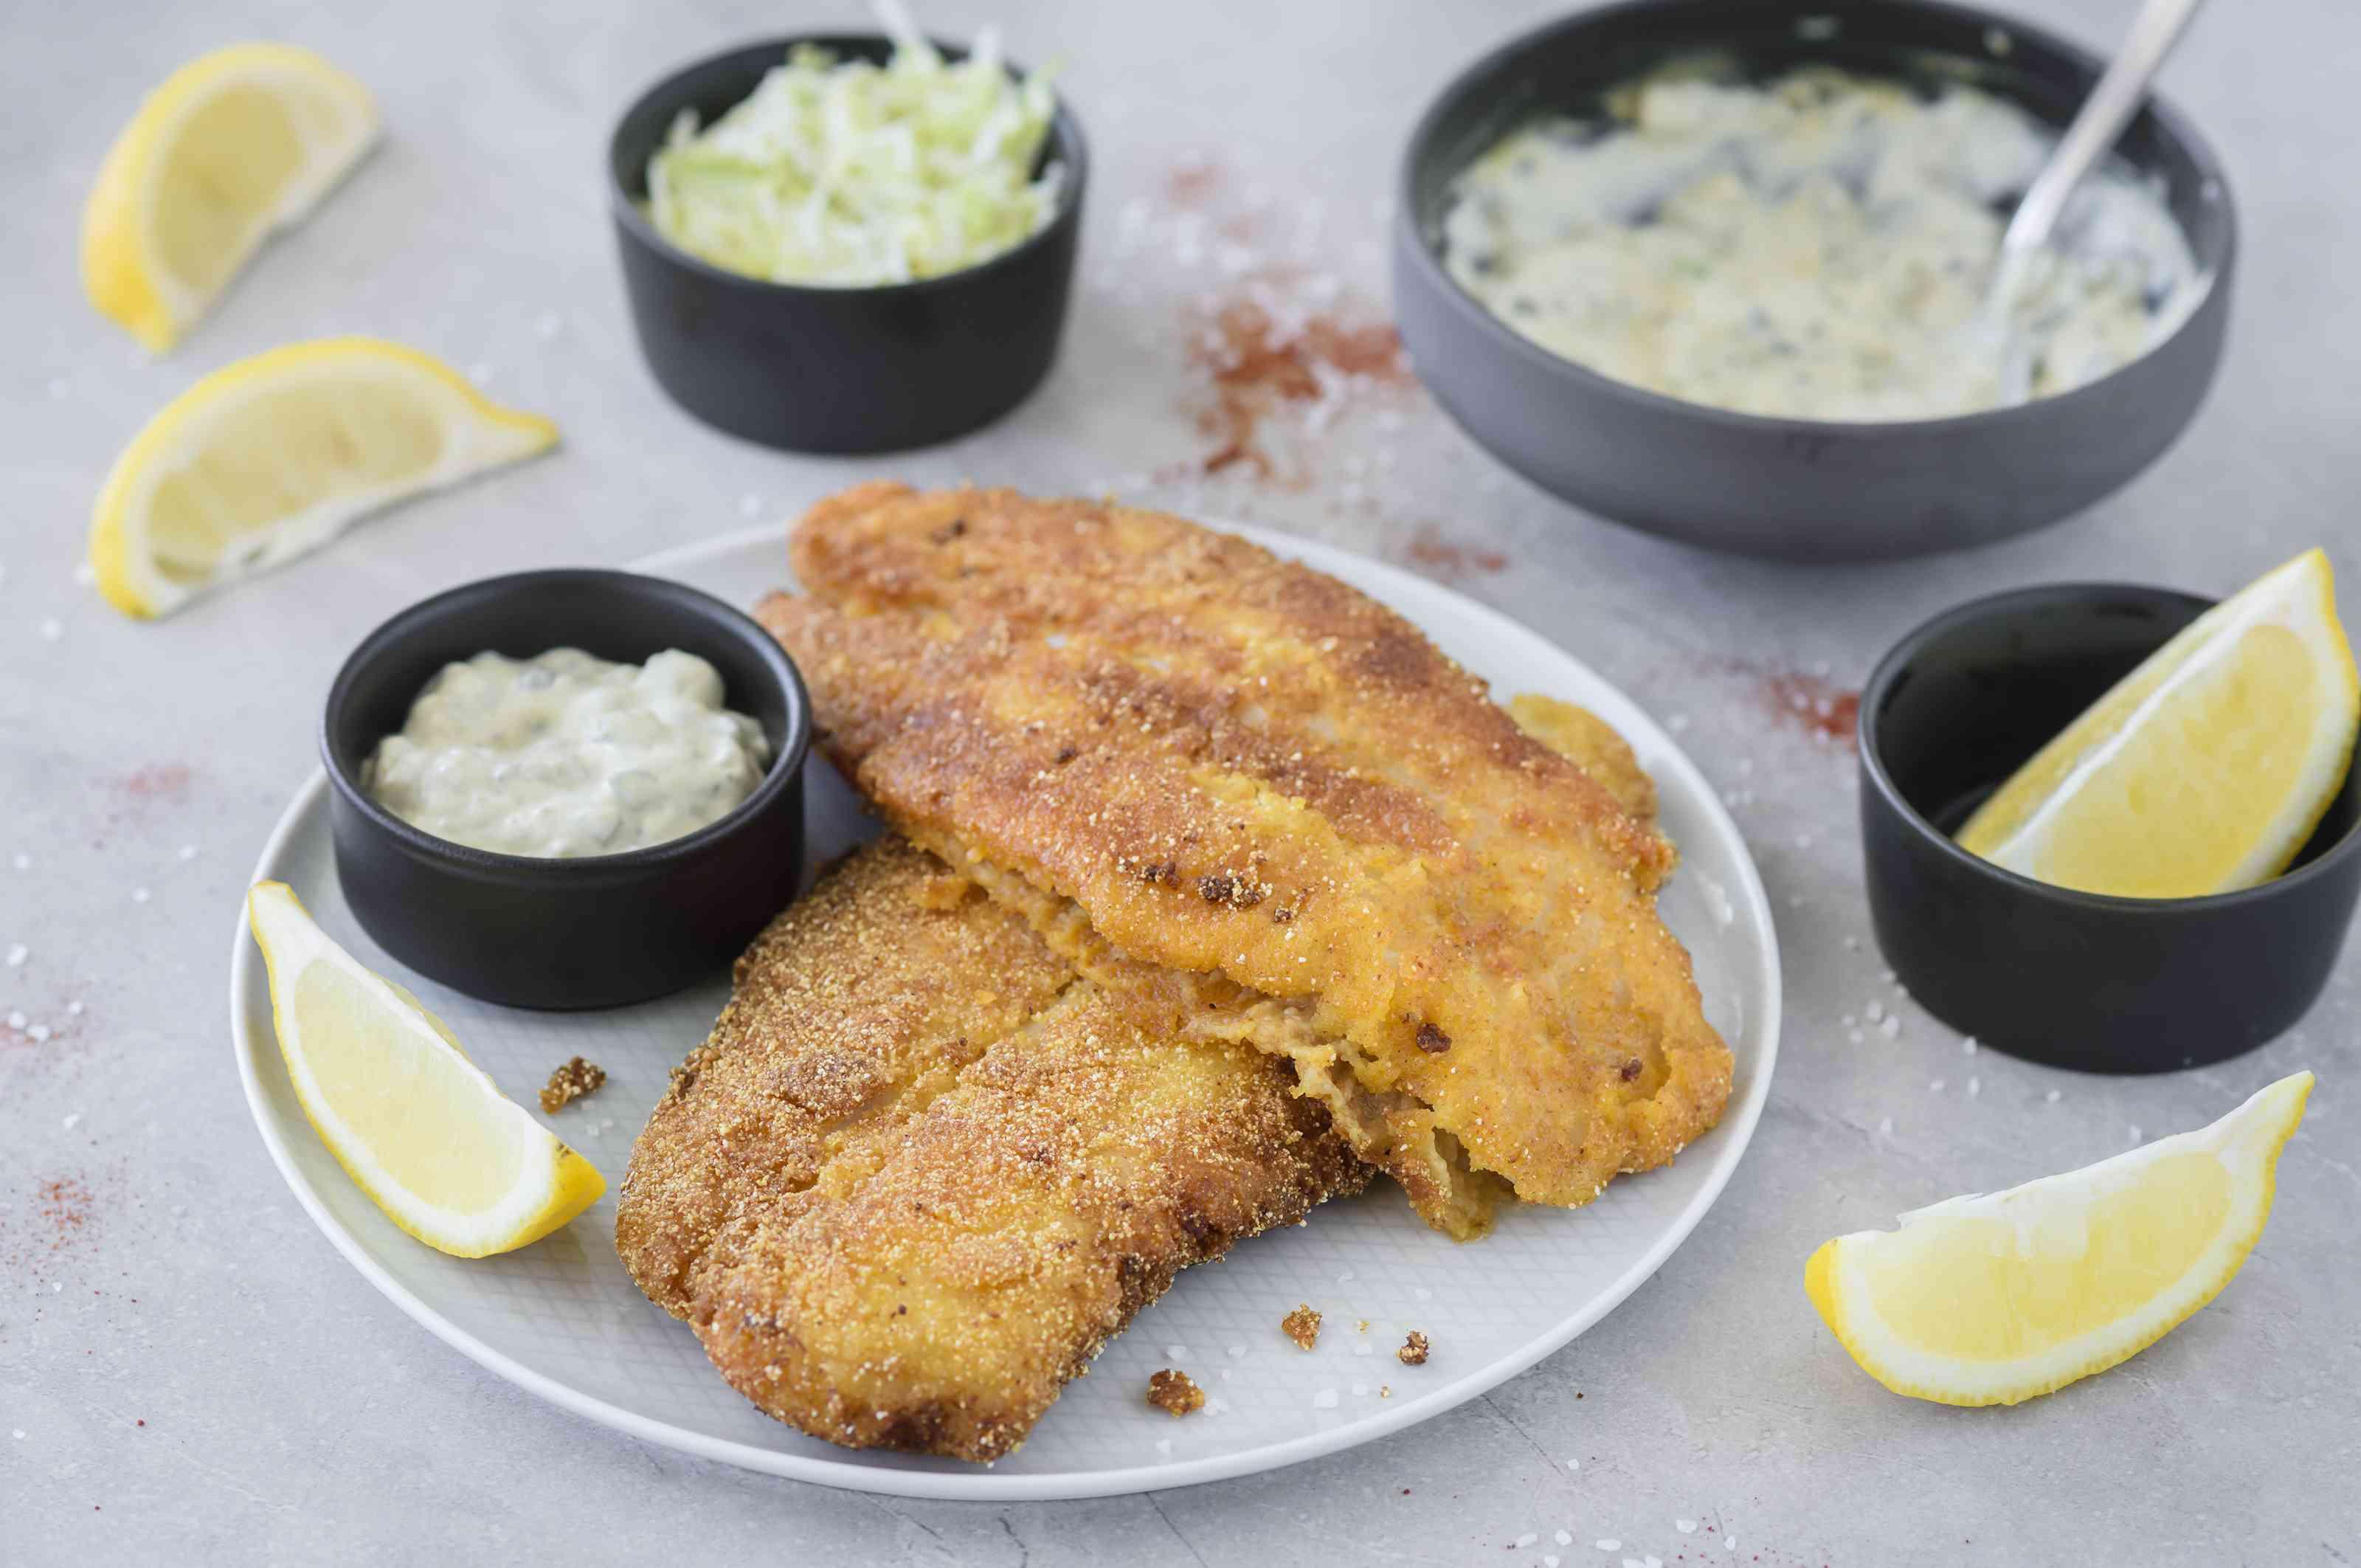 Classic summer fried catfish recipe